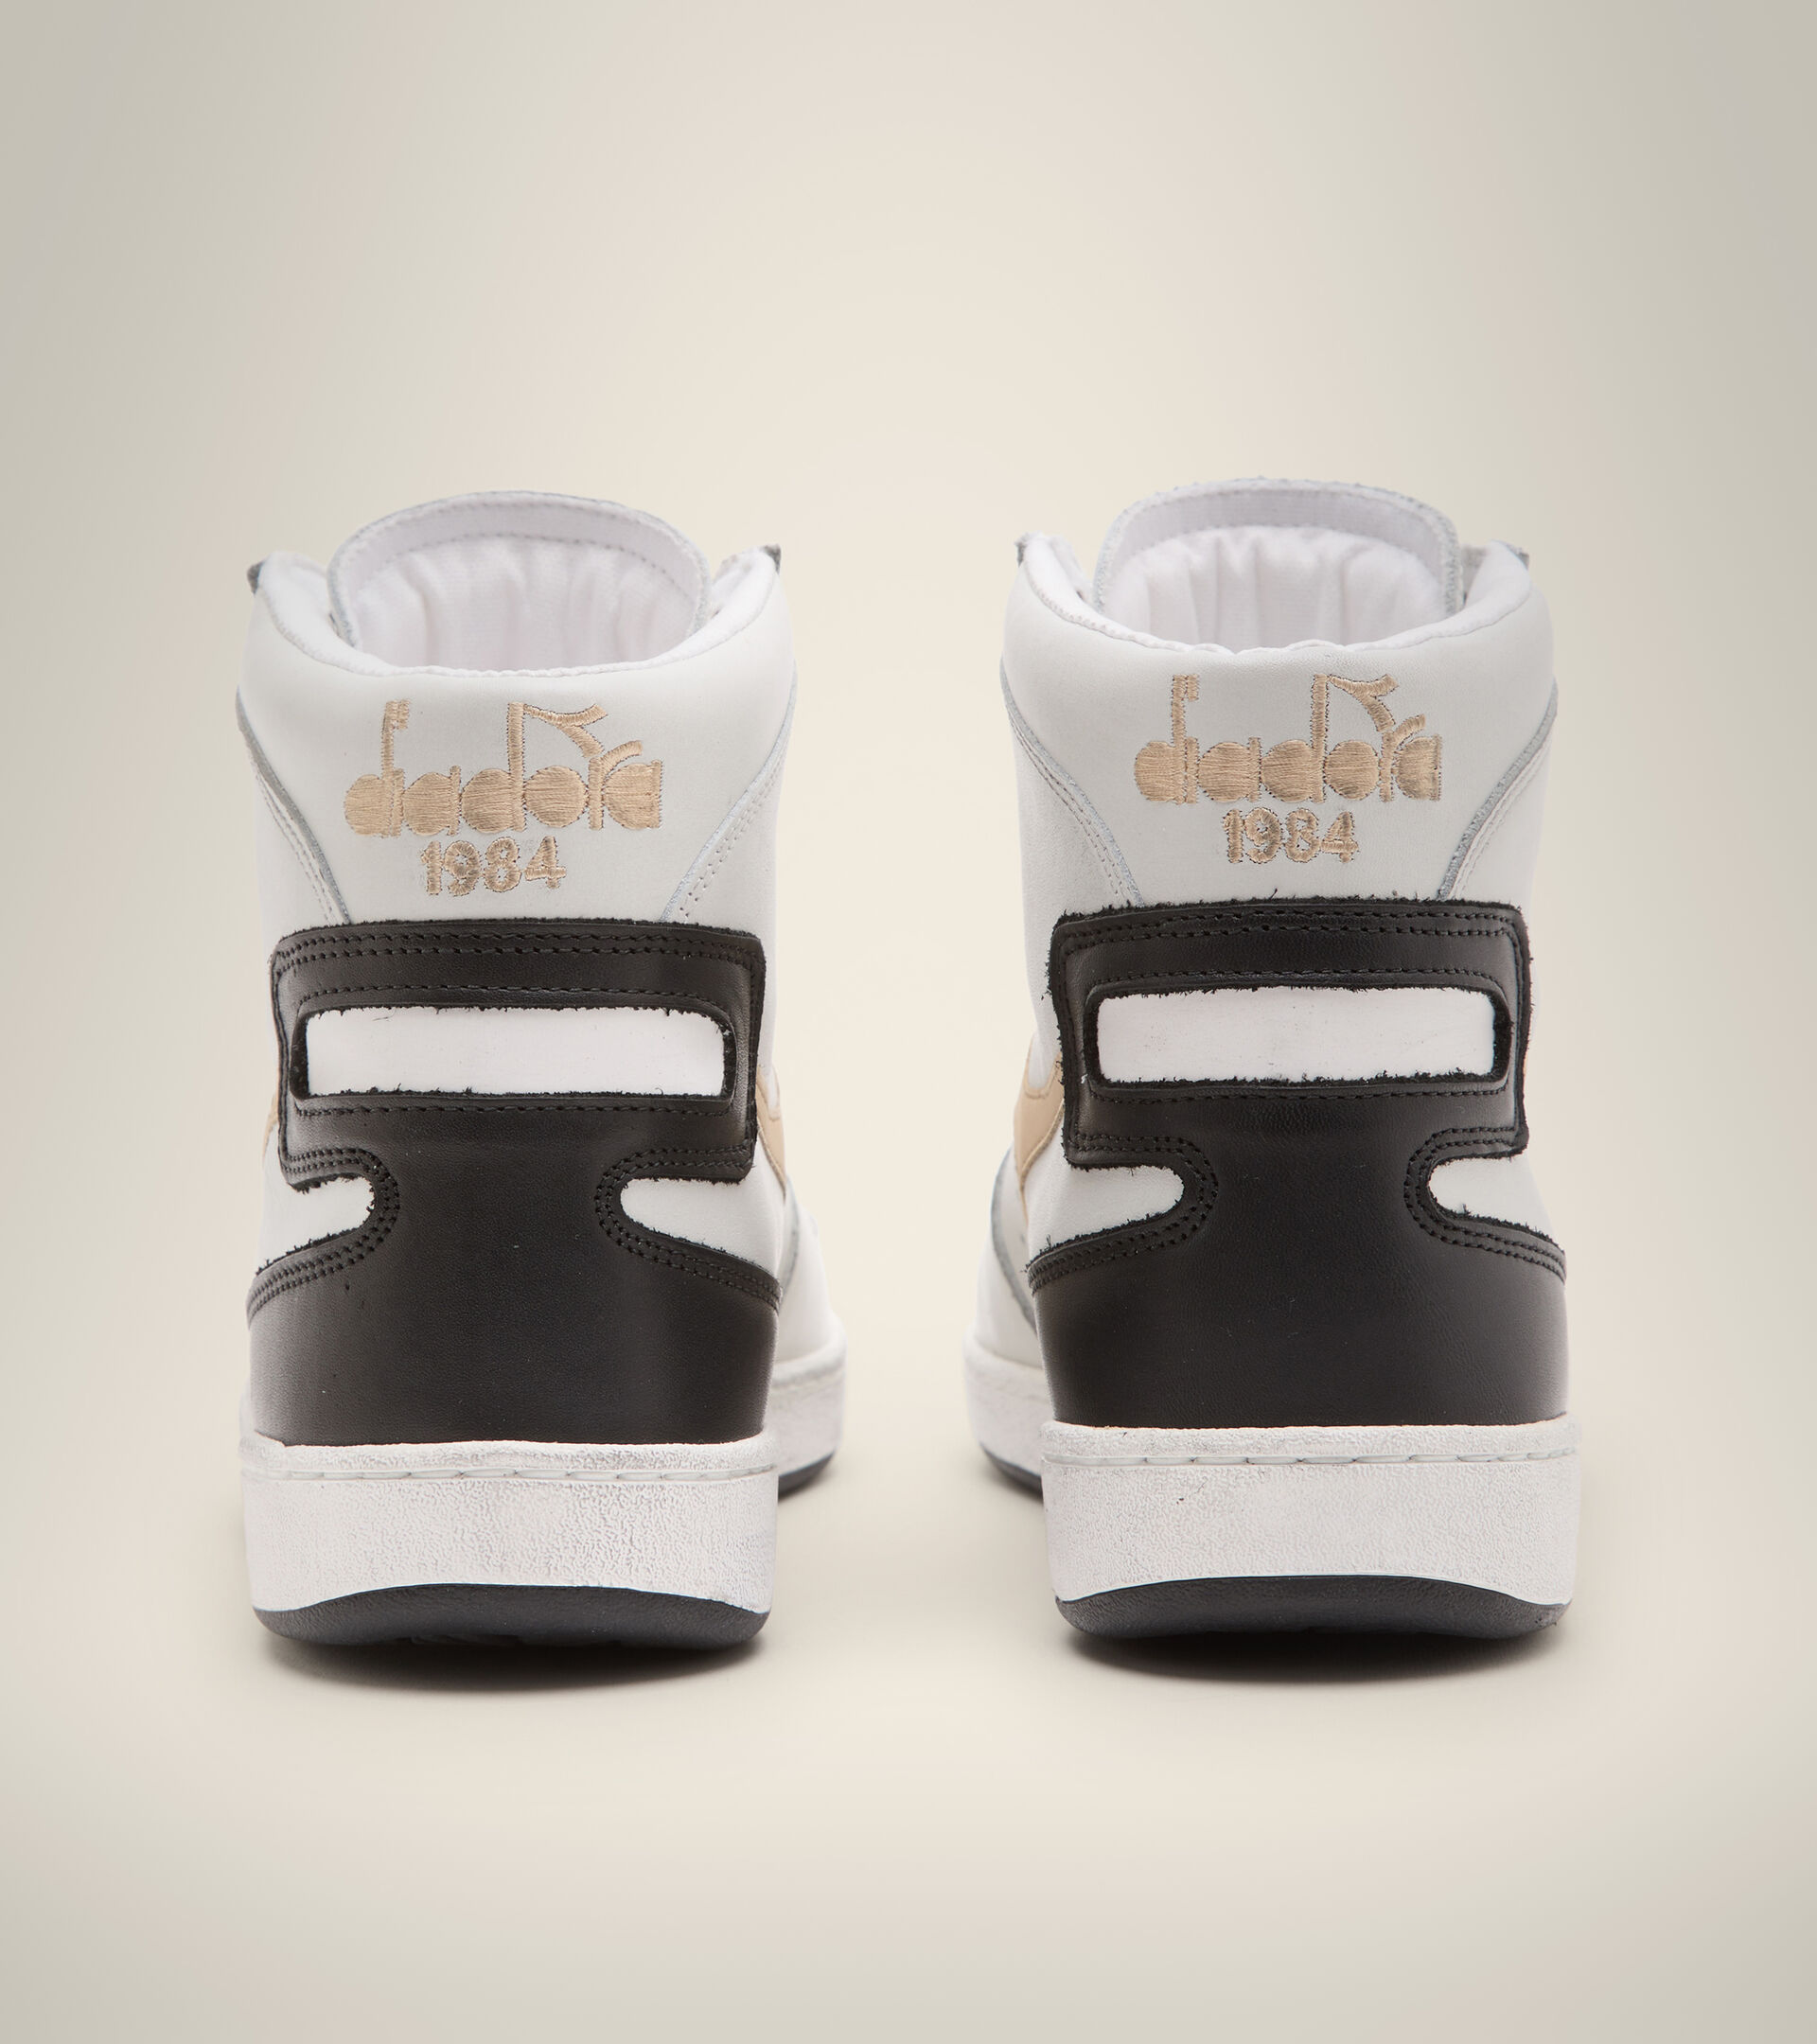 Footwear Heritage UNISEX MI BASKET USED BLANCO/BEIGE CAFE CON LECHE Diadora